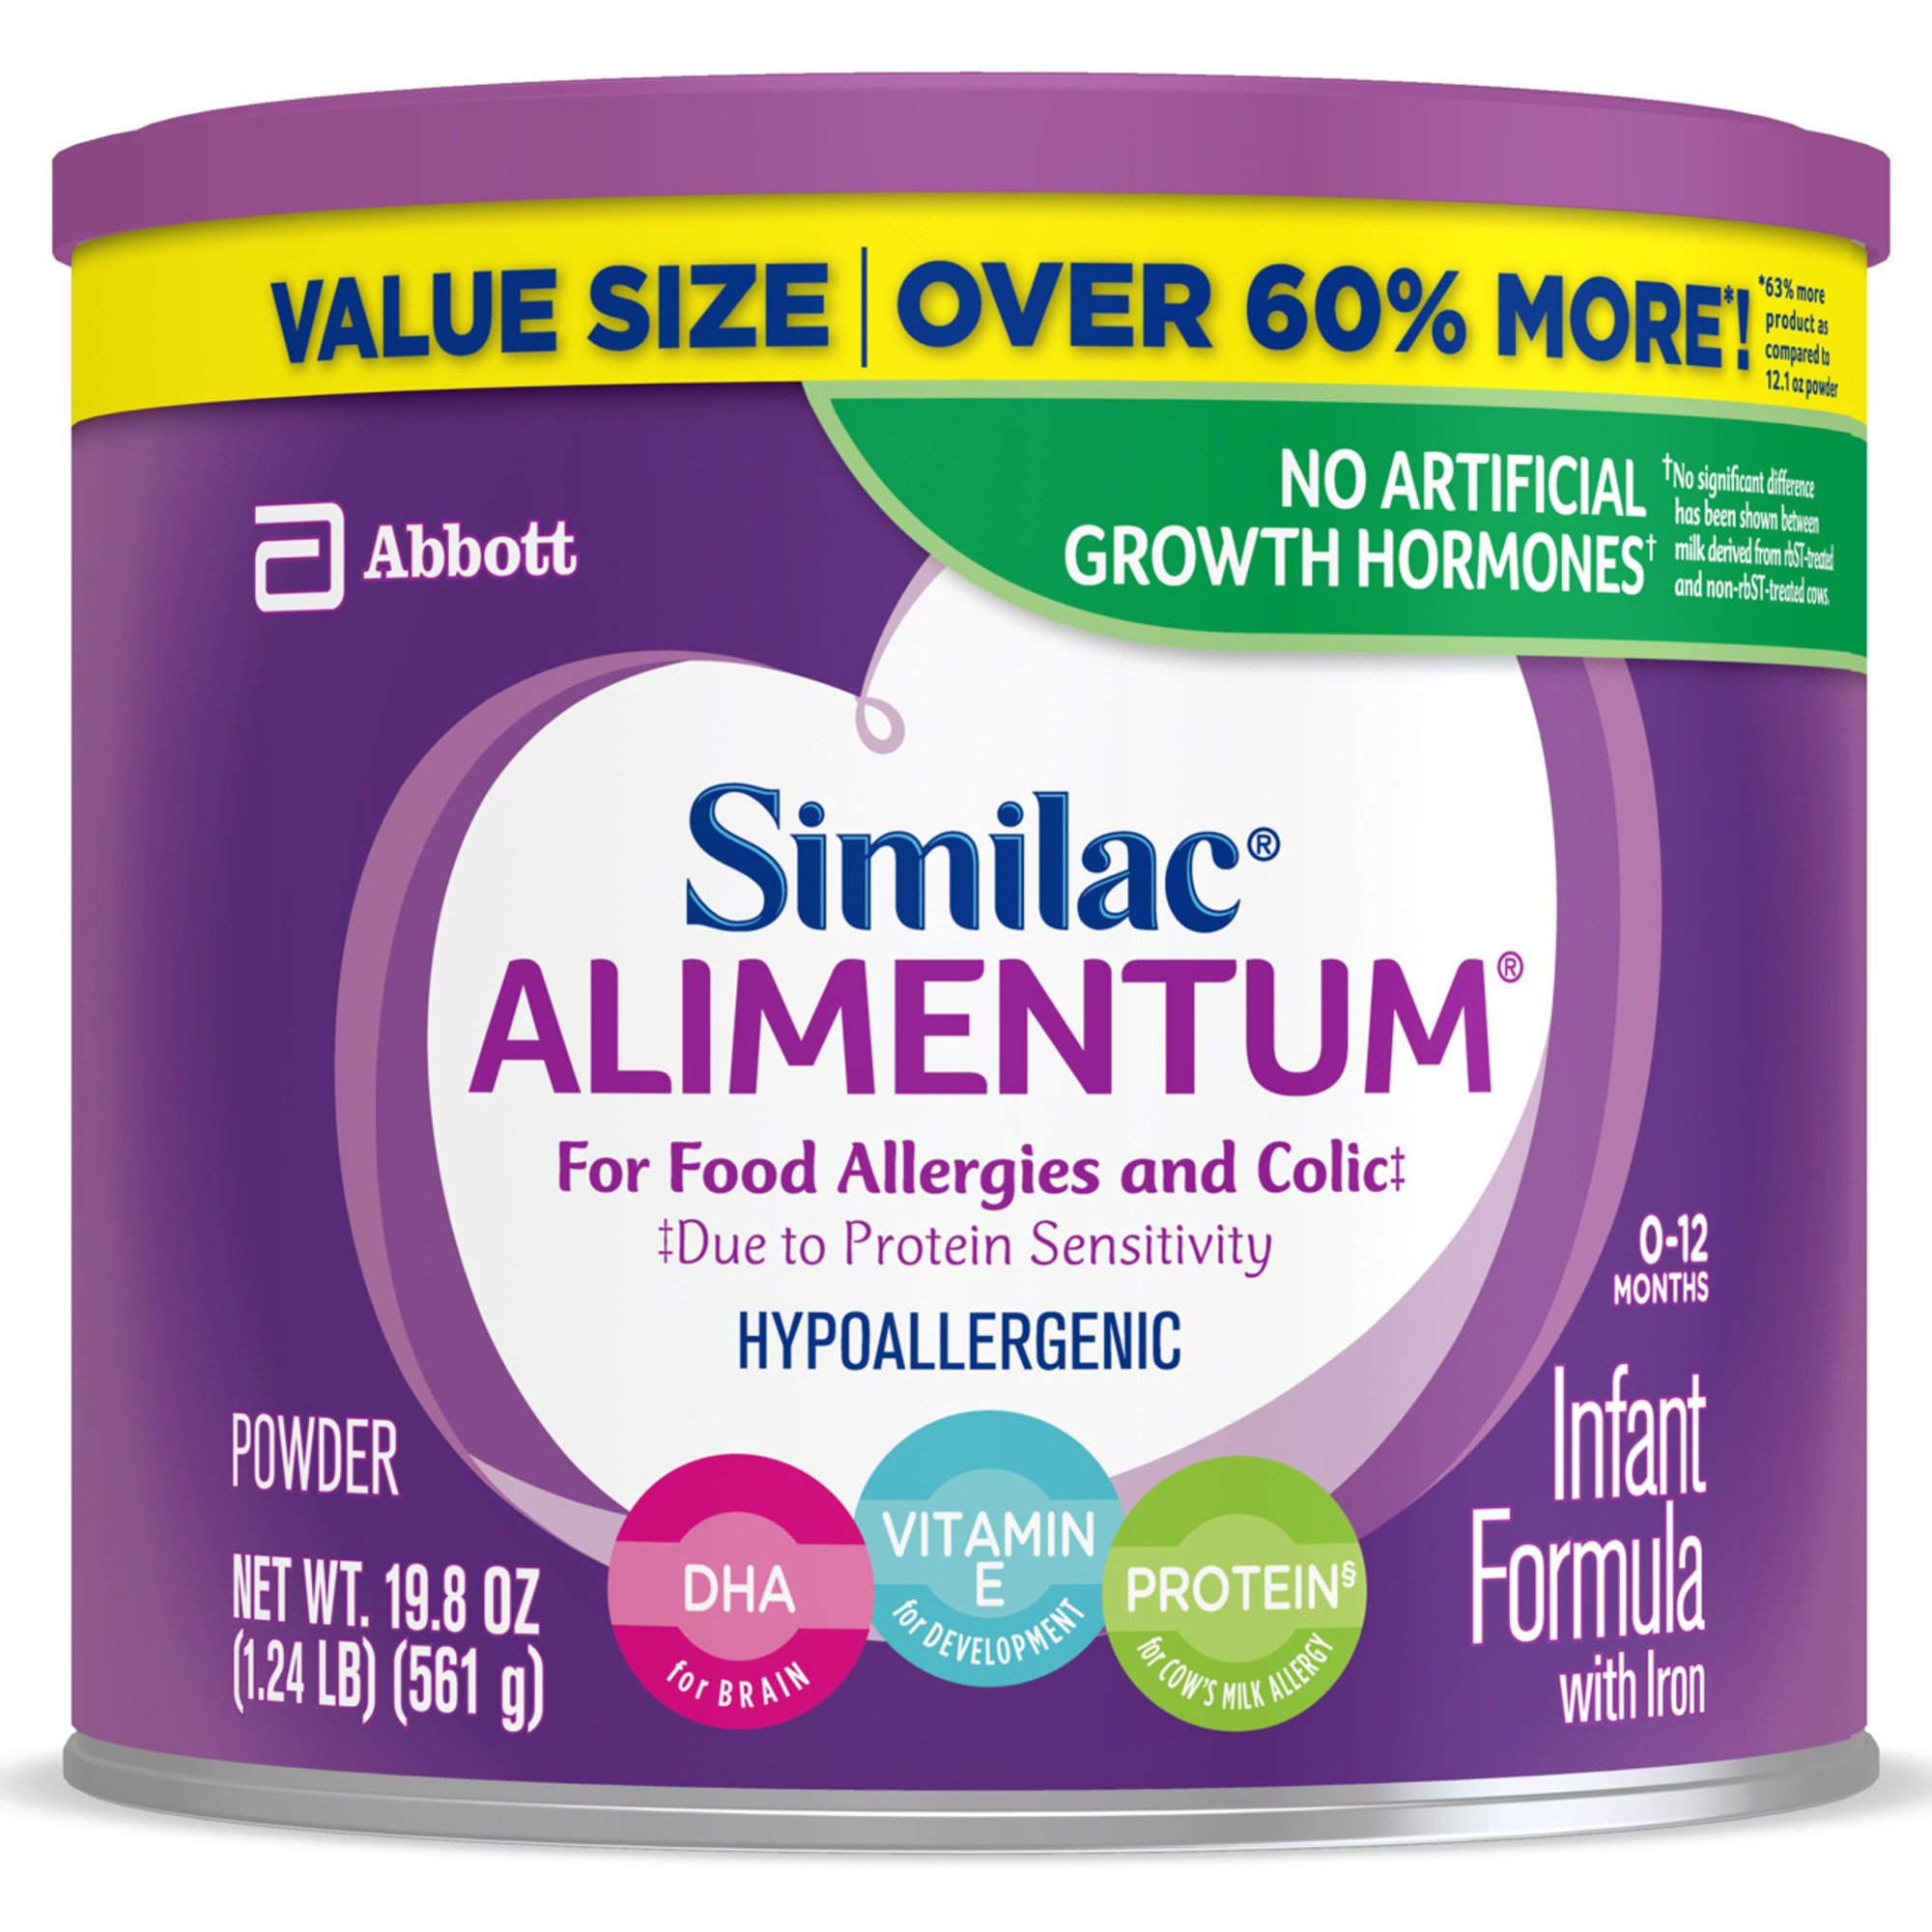 Alimentum Ready To Feed 2 Oz similac alimentum hypoallergenic infant formula powder with iron